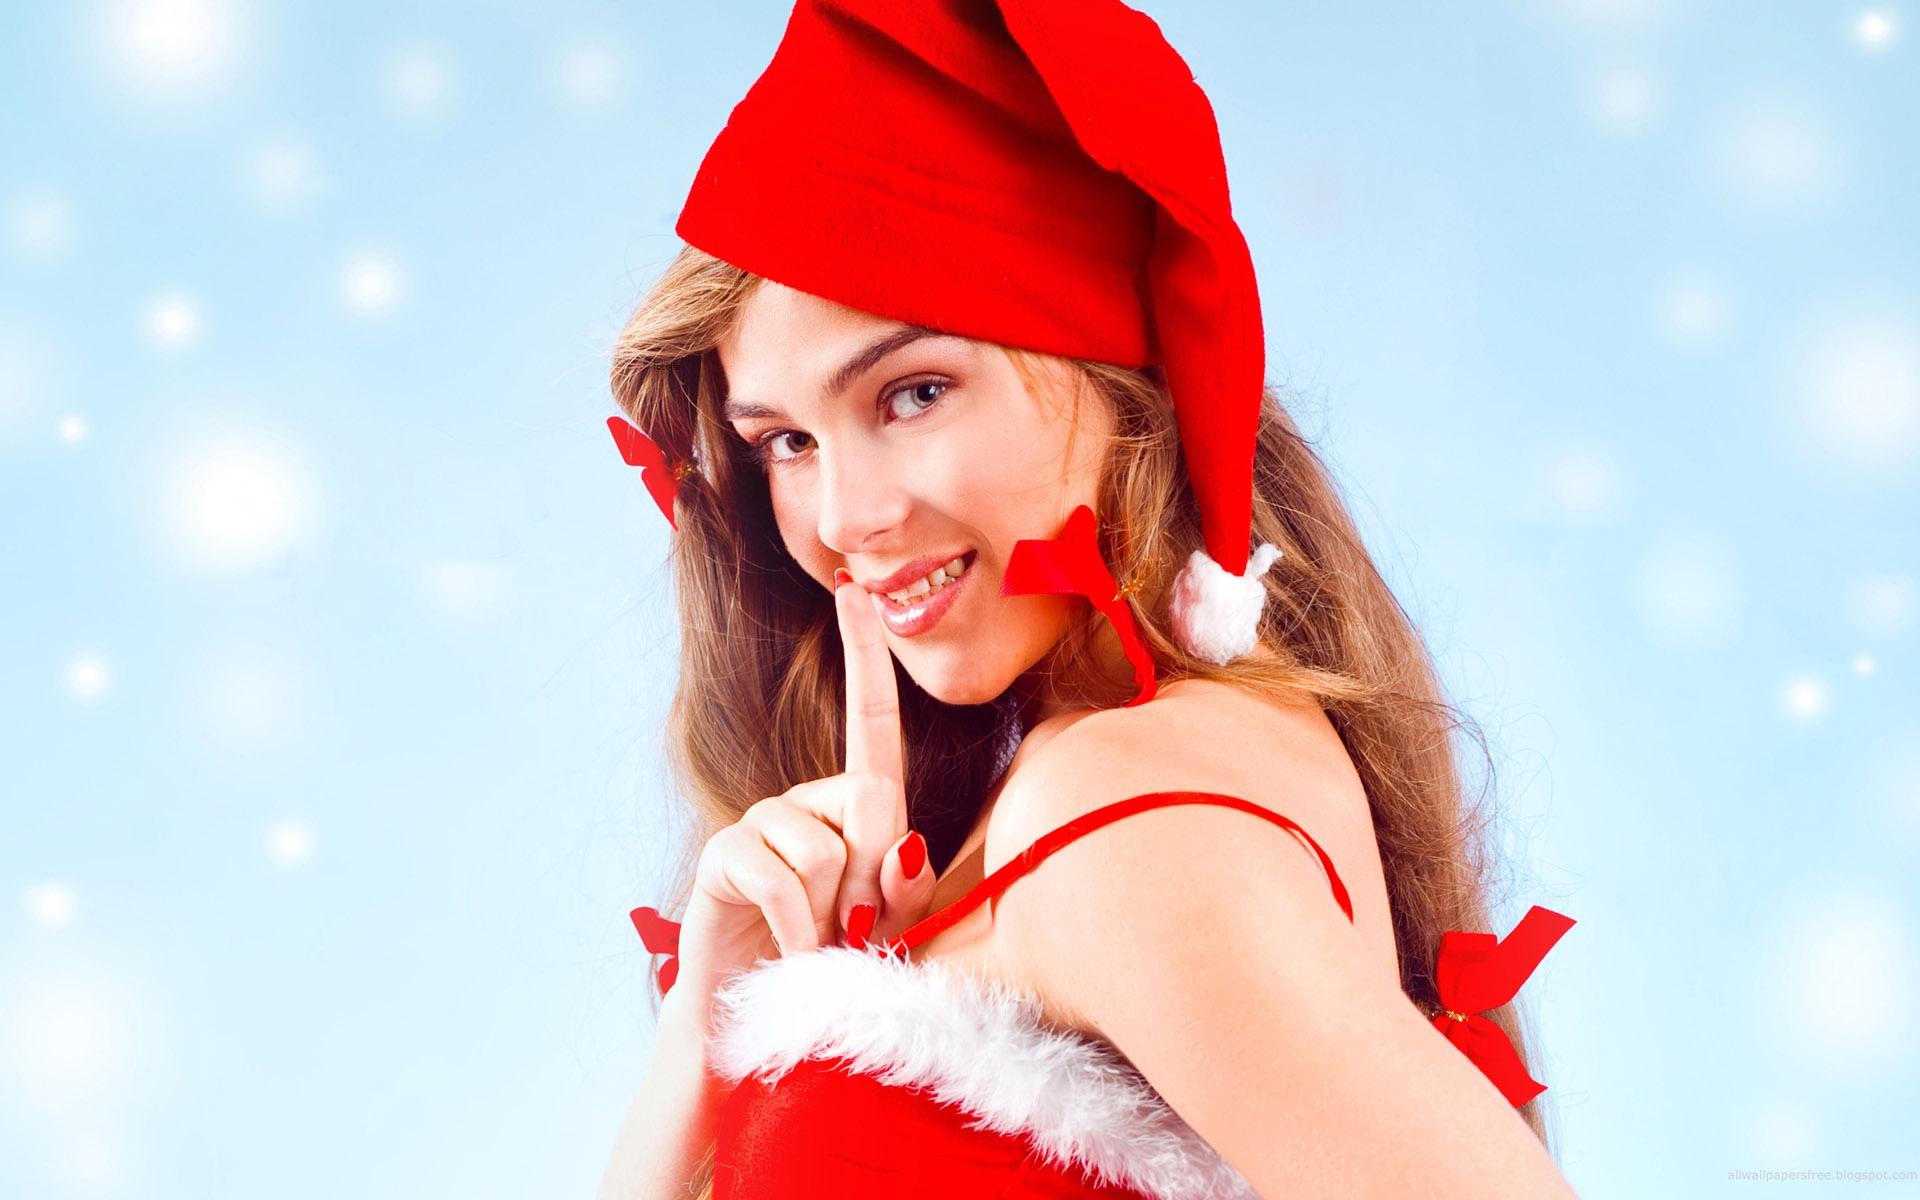 sexy christmas girls hd wallpaper 1 29